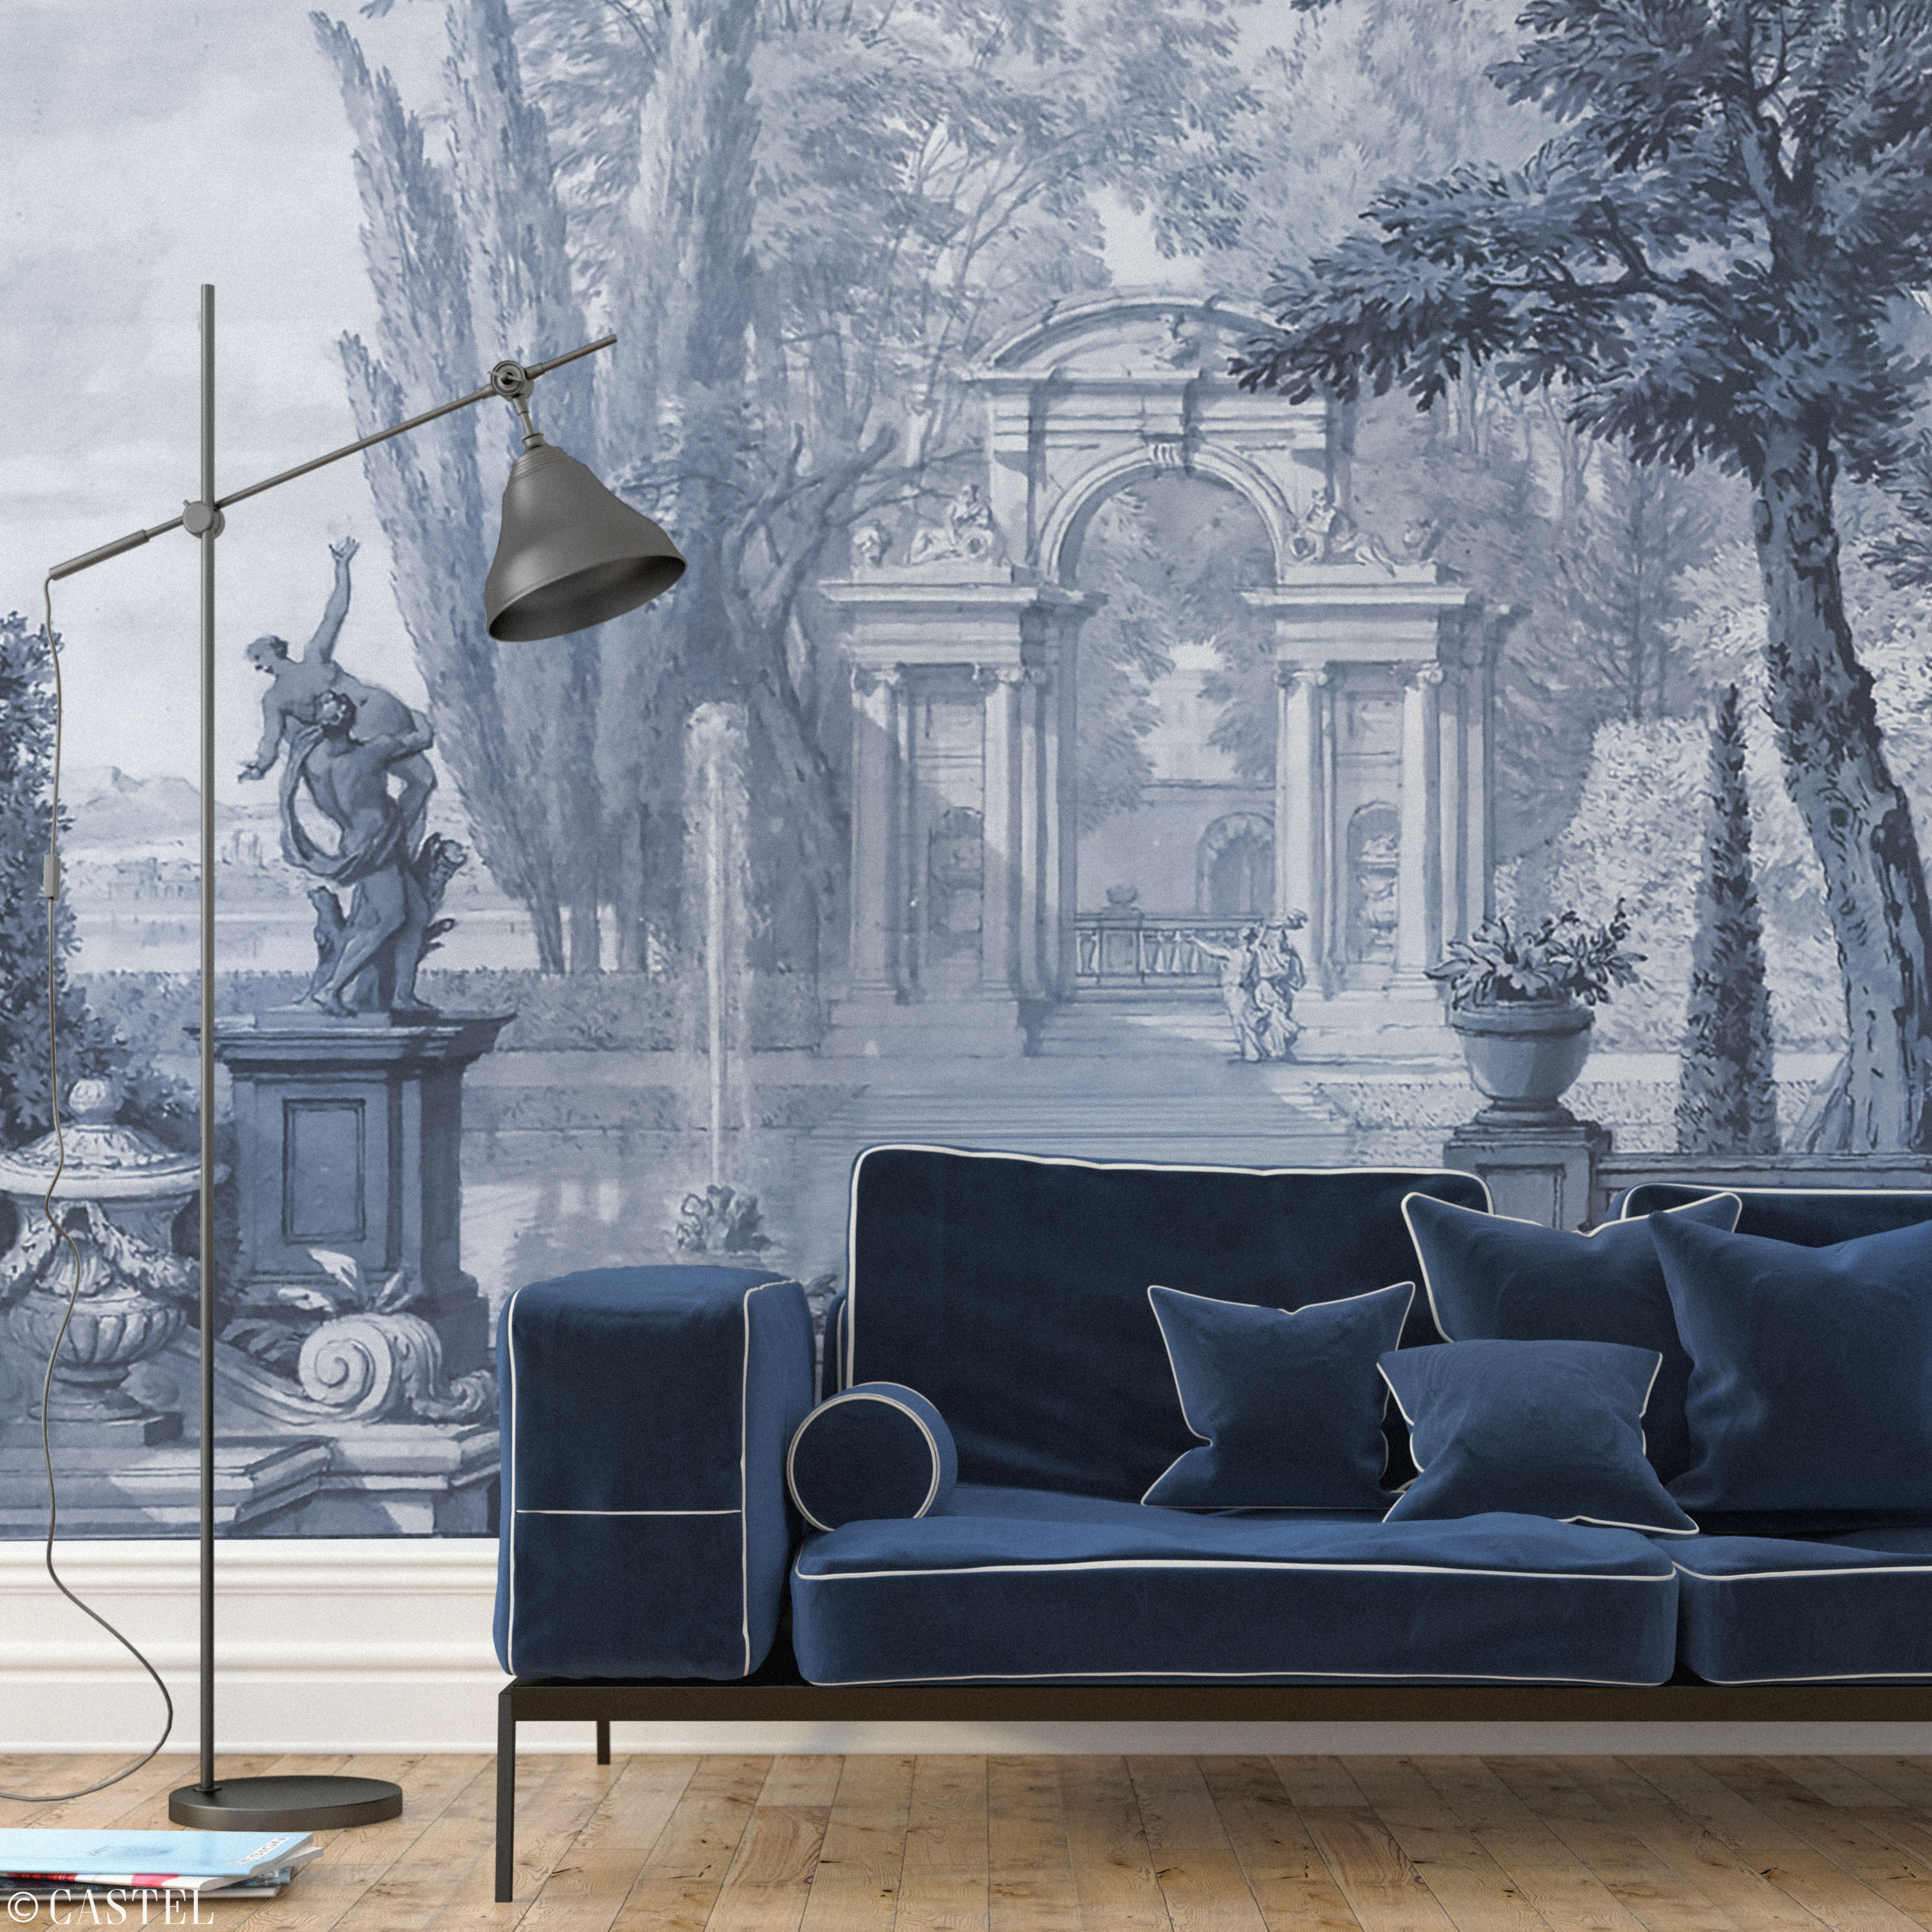 China blue your castel custom wallpaper bespoke for Chinese style wallpaper uk